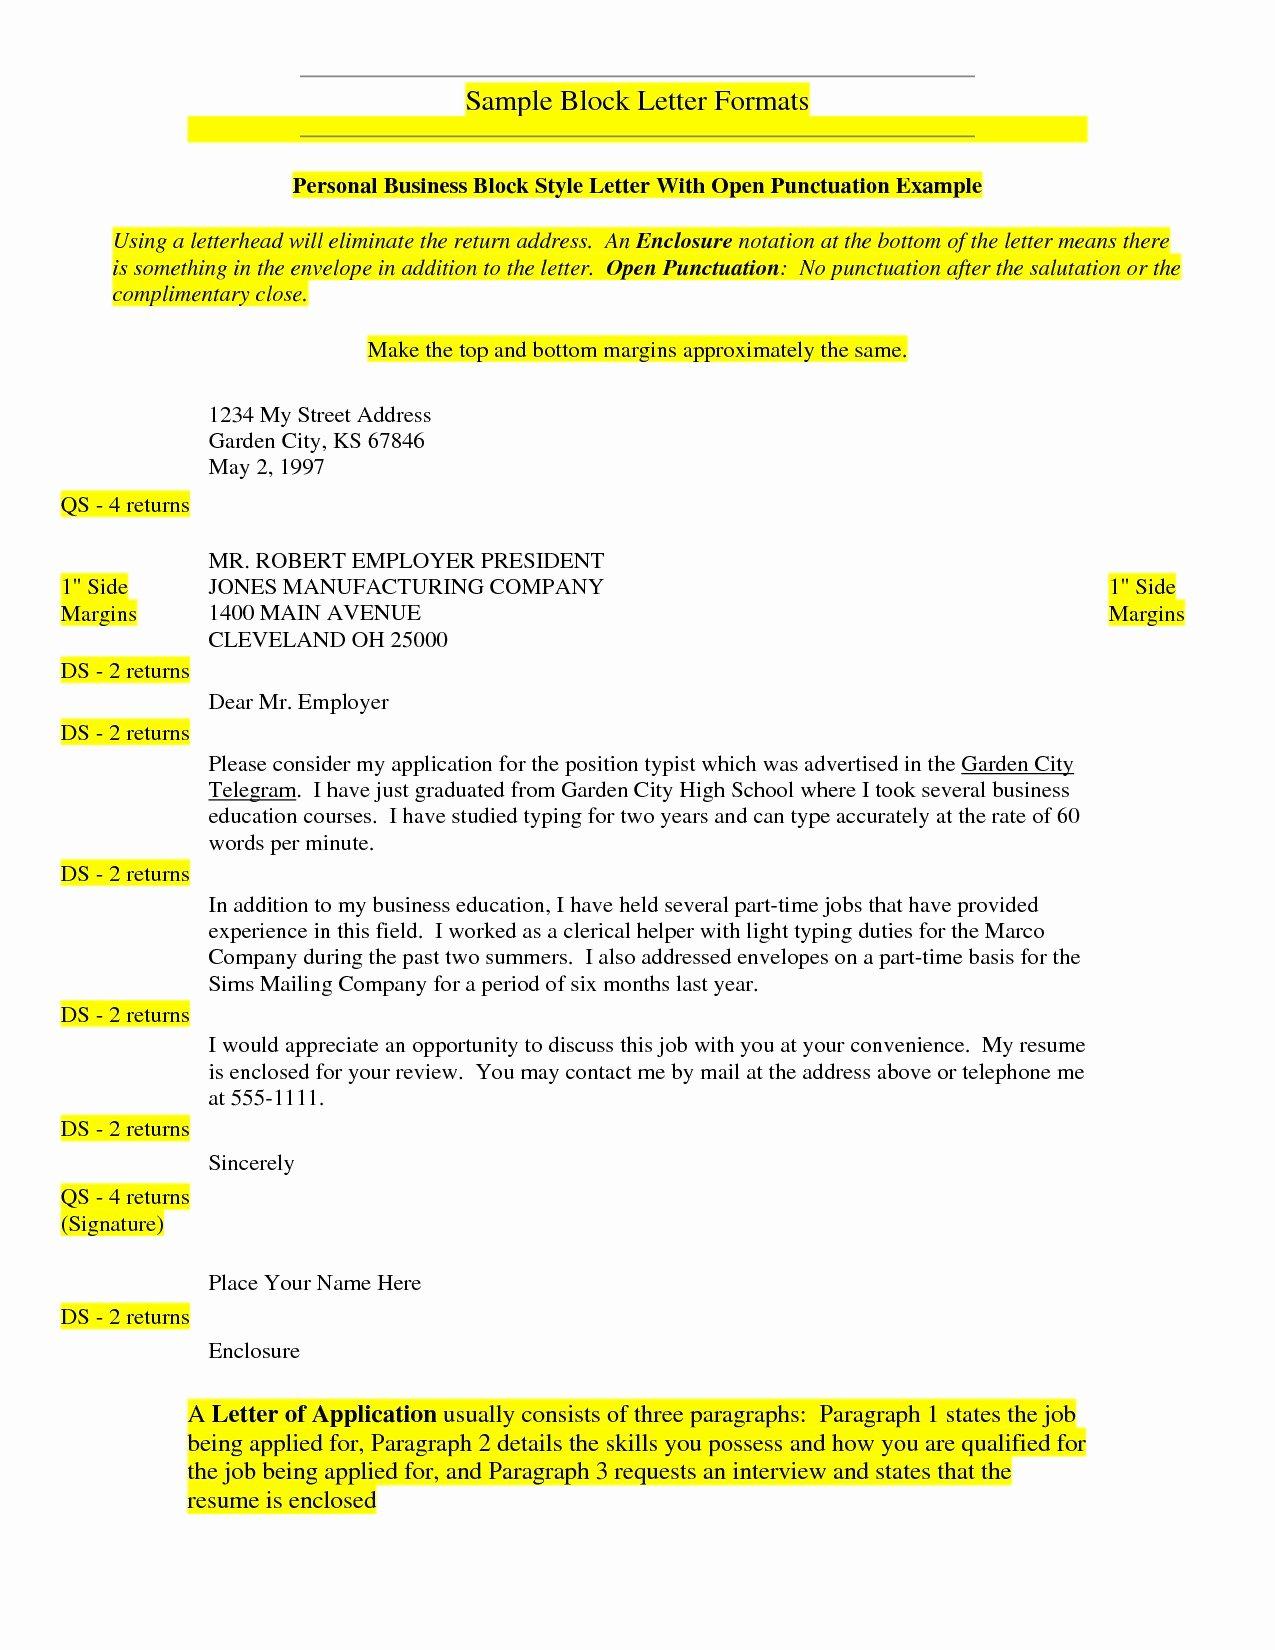 Letter format with Enclosures Elegant New Block Letter format with Enclosure